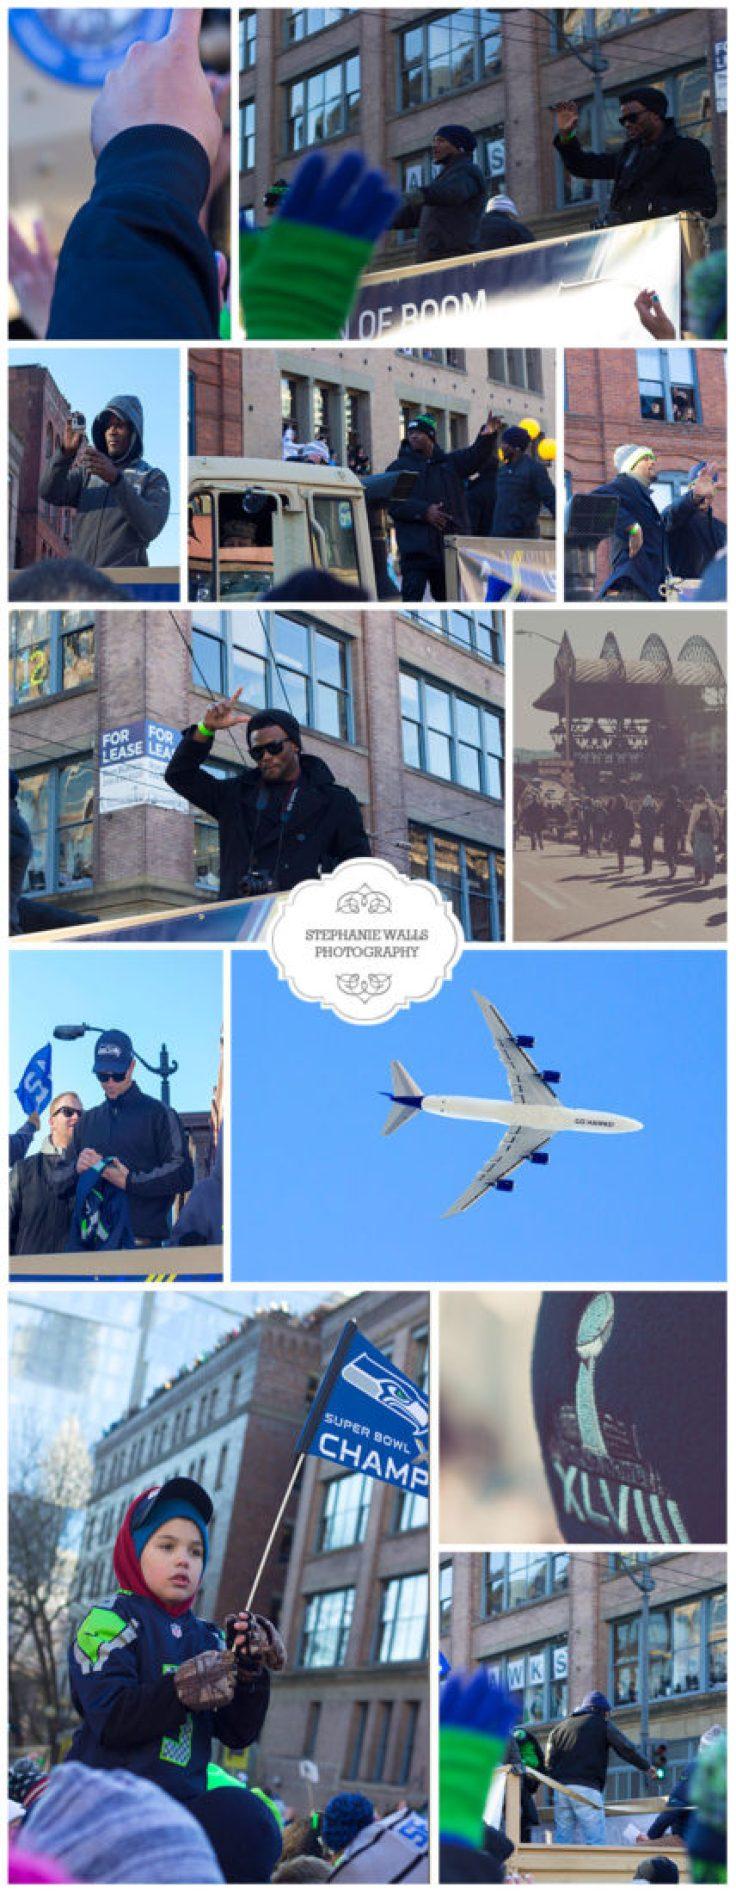 Seahawk parade 2 700,000 SEAHAWK PARADE|SEATTLE PHOTOGRAPHER